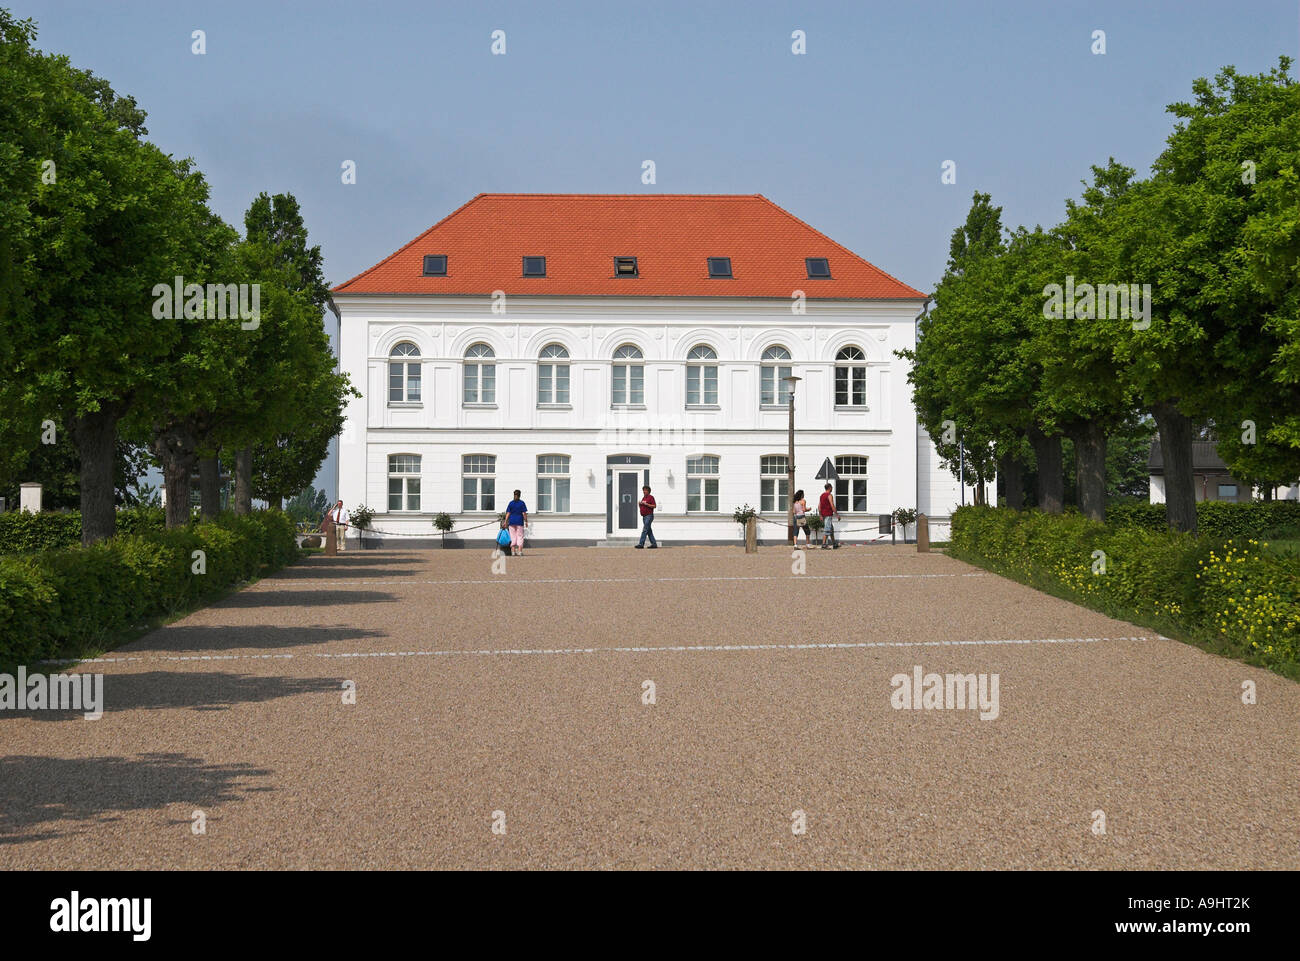 Building at the Circus of Putbus, Ruegen island, Mecklenburg Western Pomerania Stock Photo